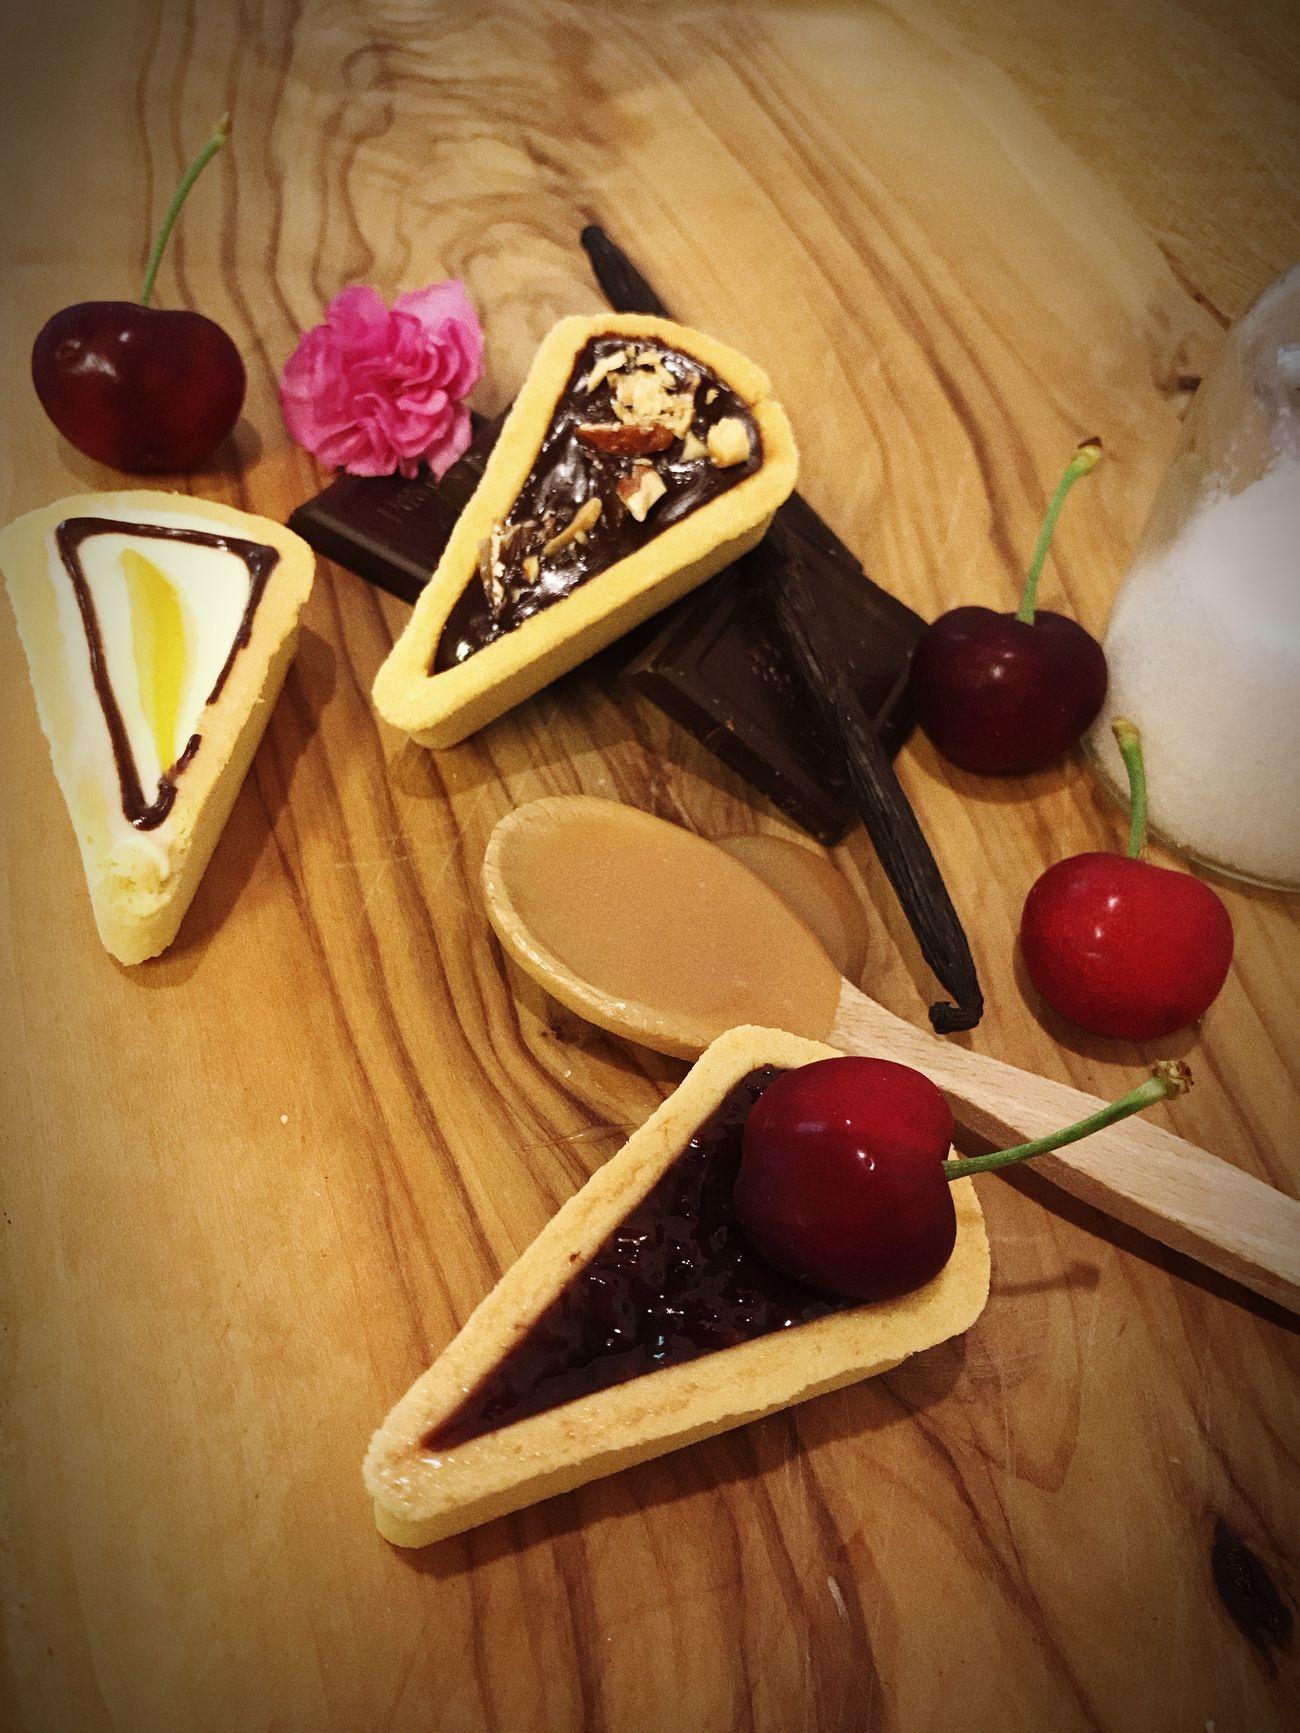 Food Sweet Food Dessert Pastrychef Bimasfactorycakes Cakes